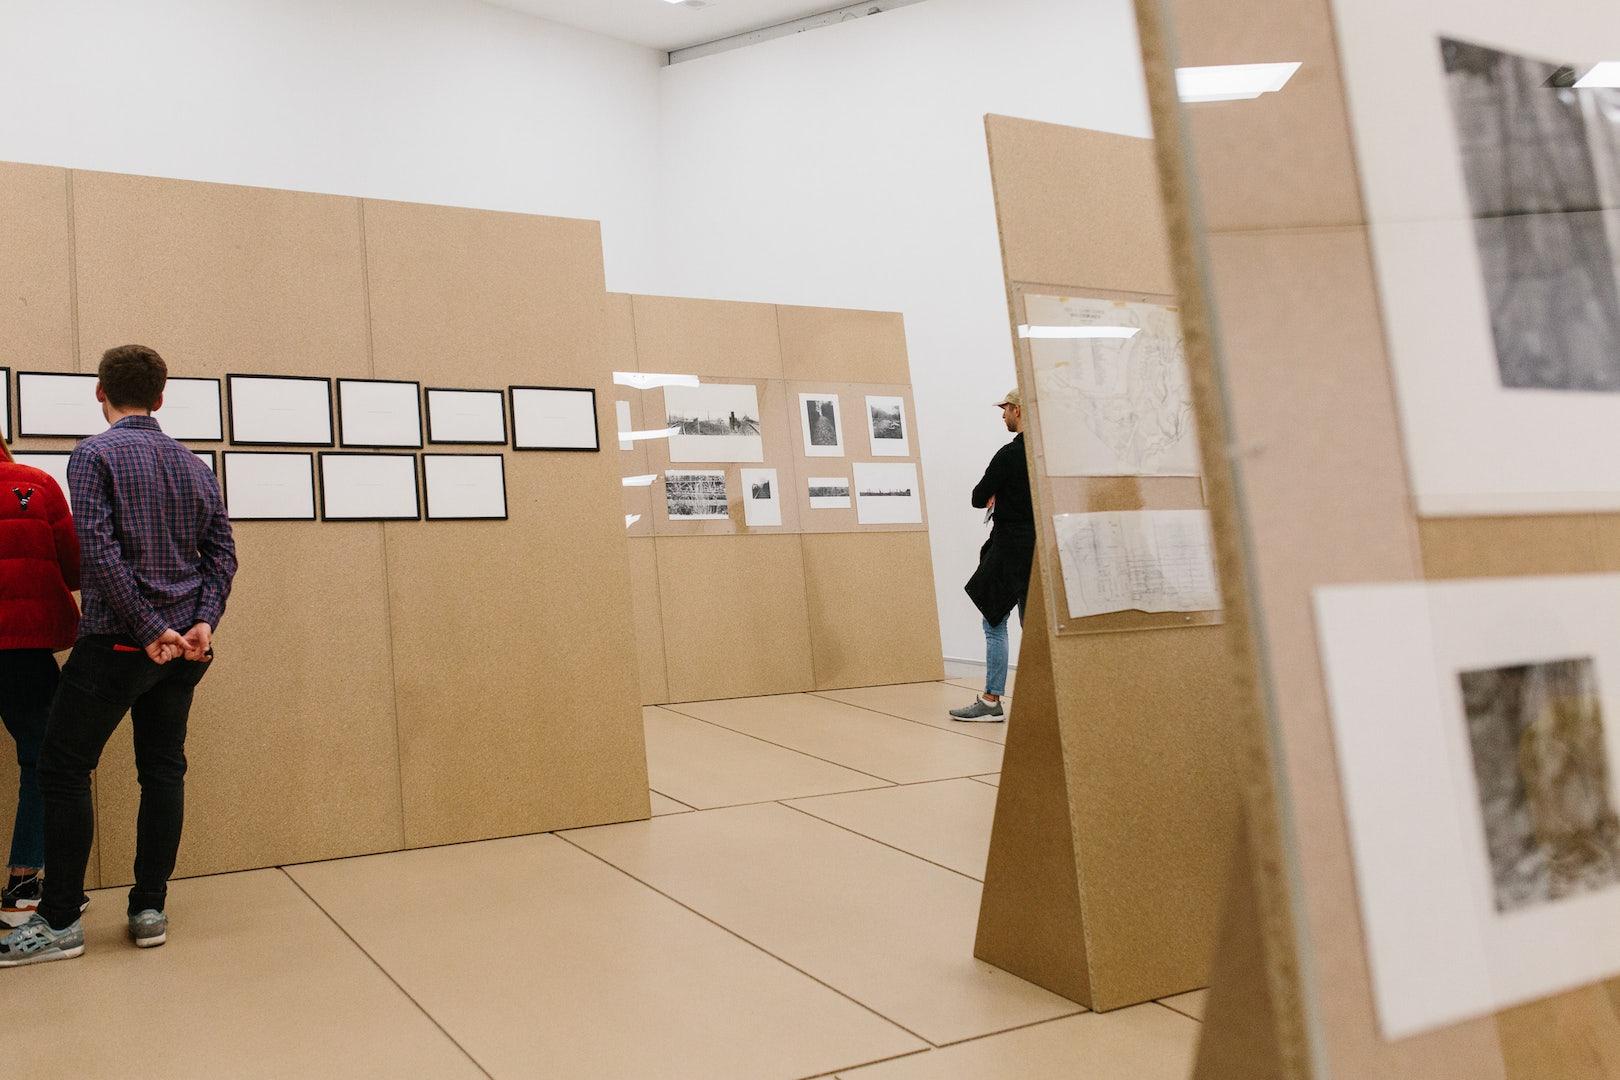 art exhibition at the MUMOK Vienna